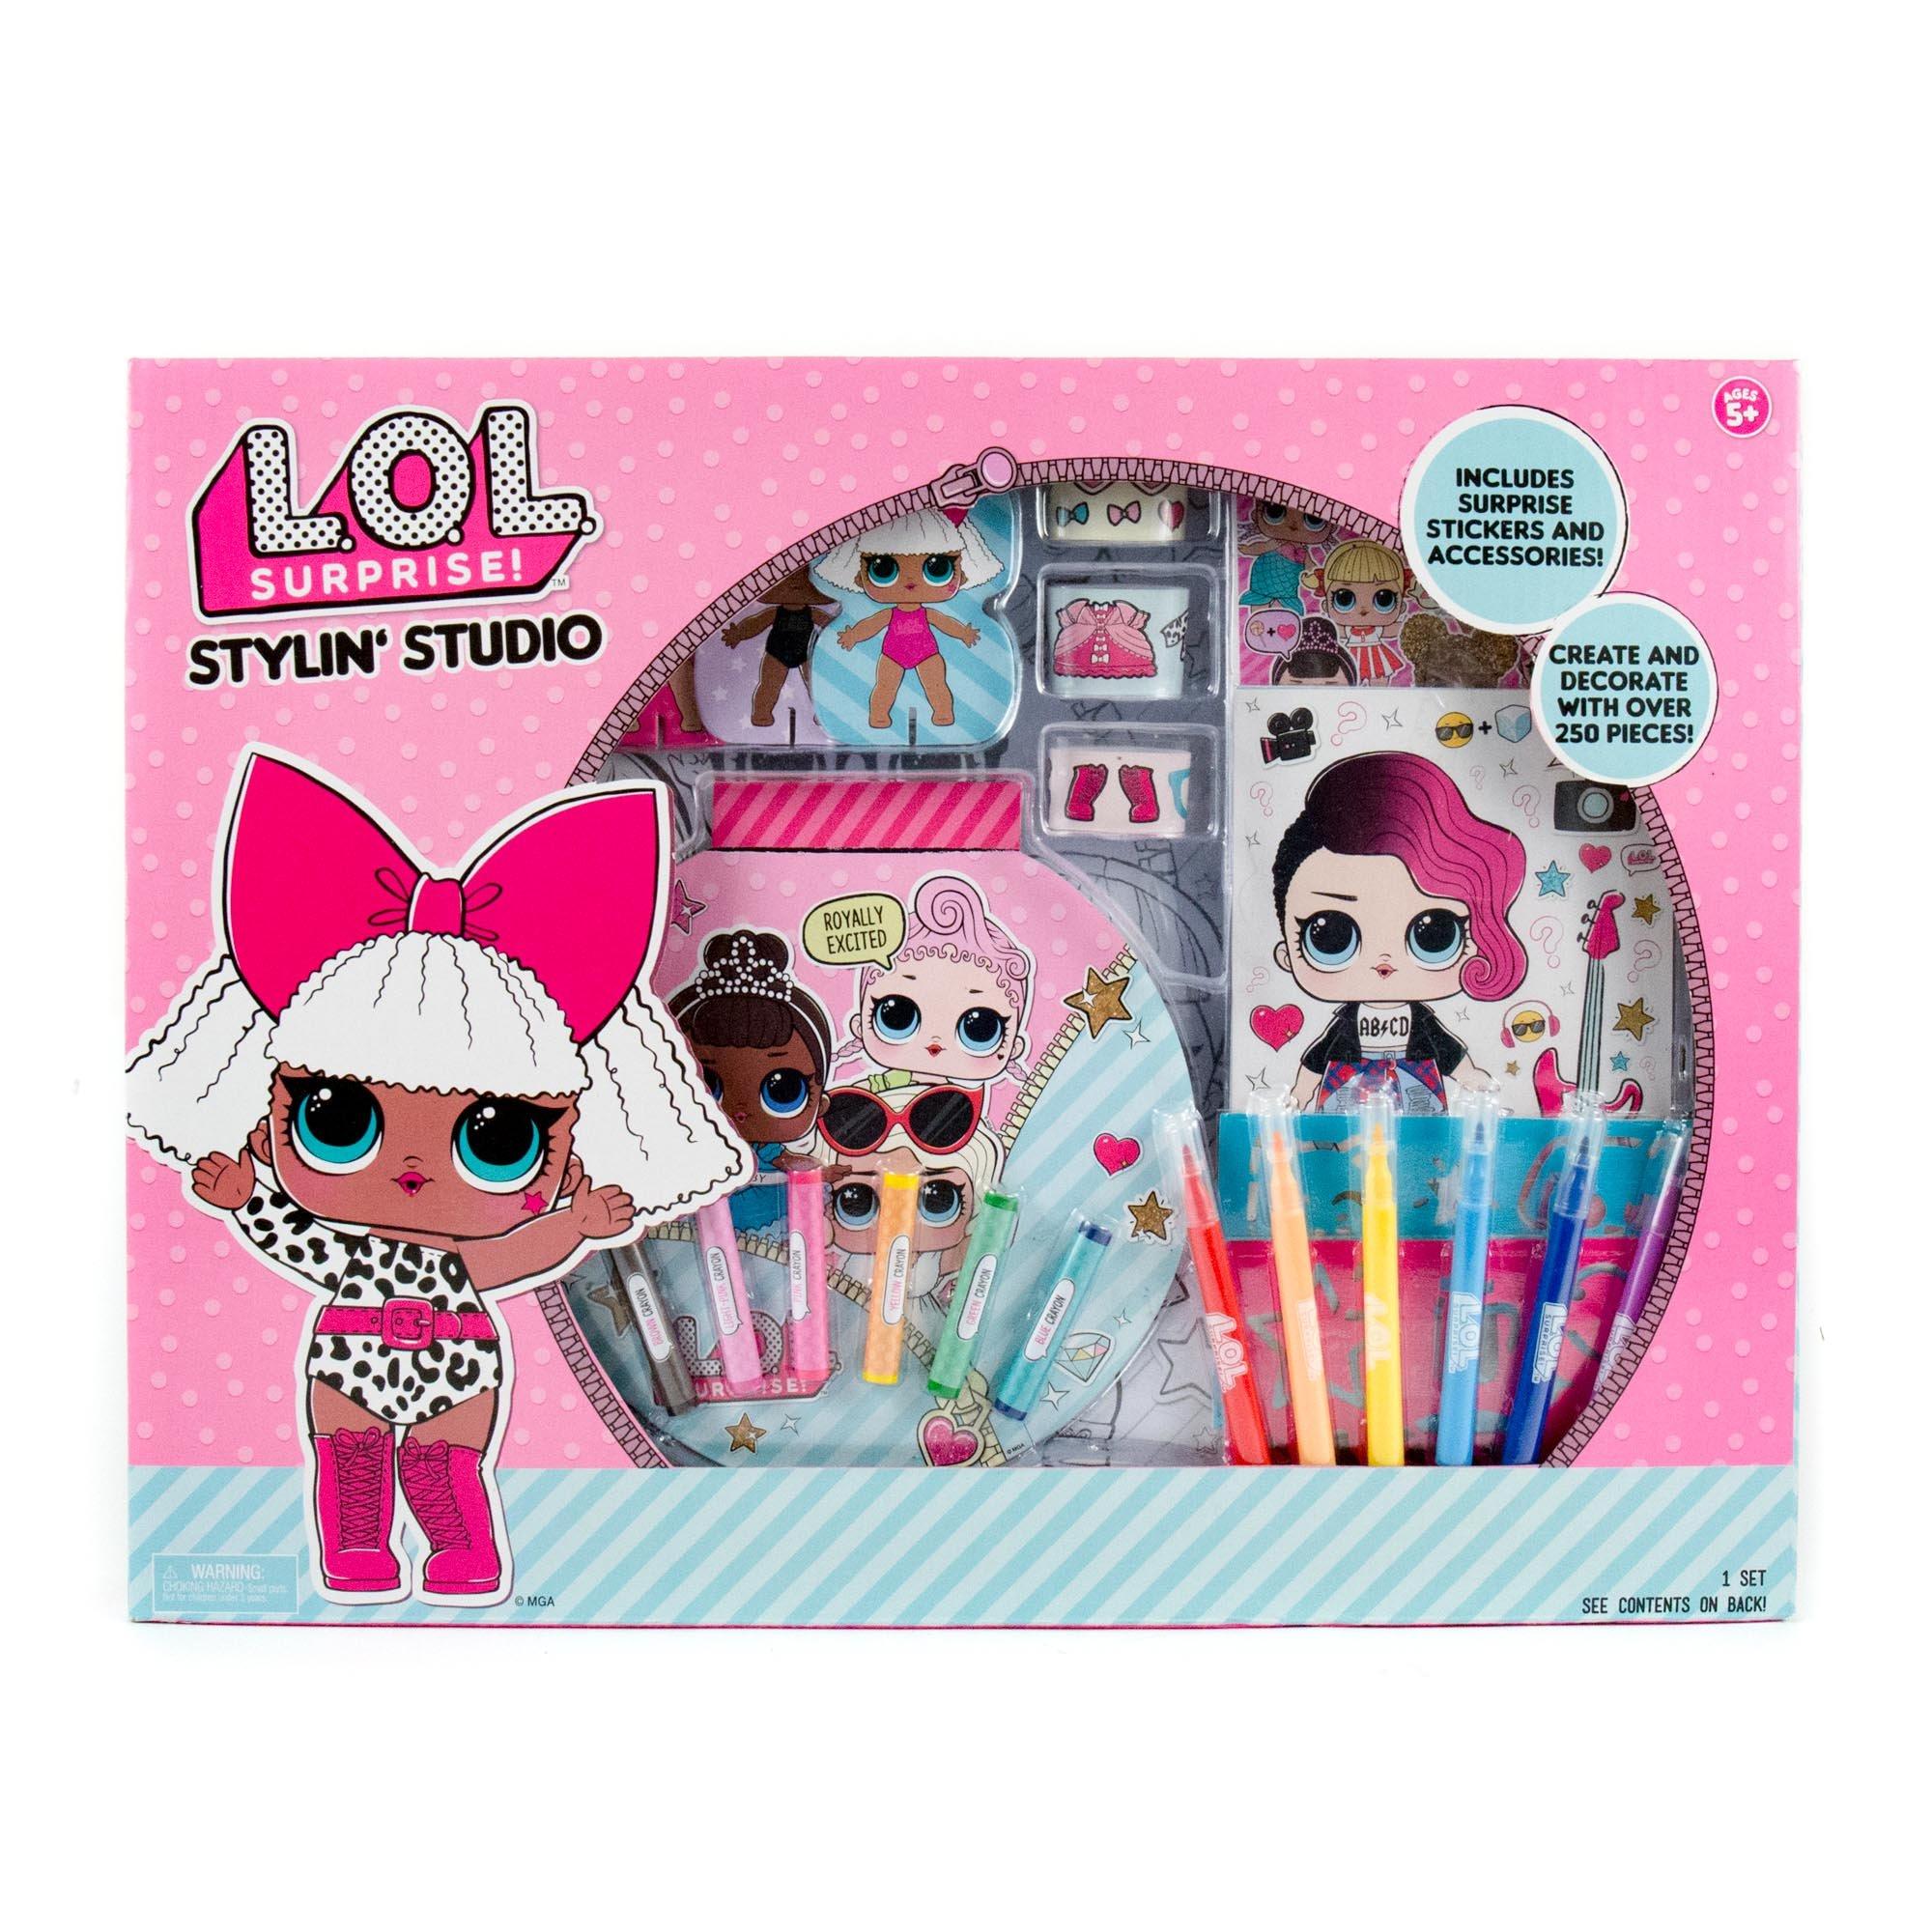 L.O.L. Surprise! Stylin' Studio by Horizon Group USA